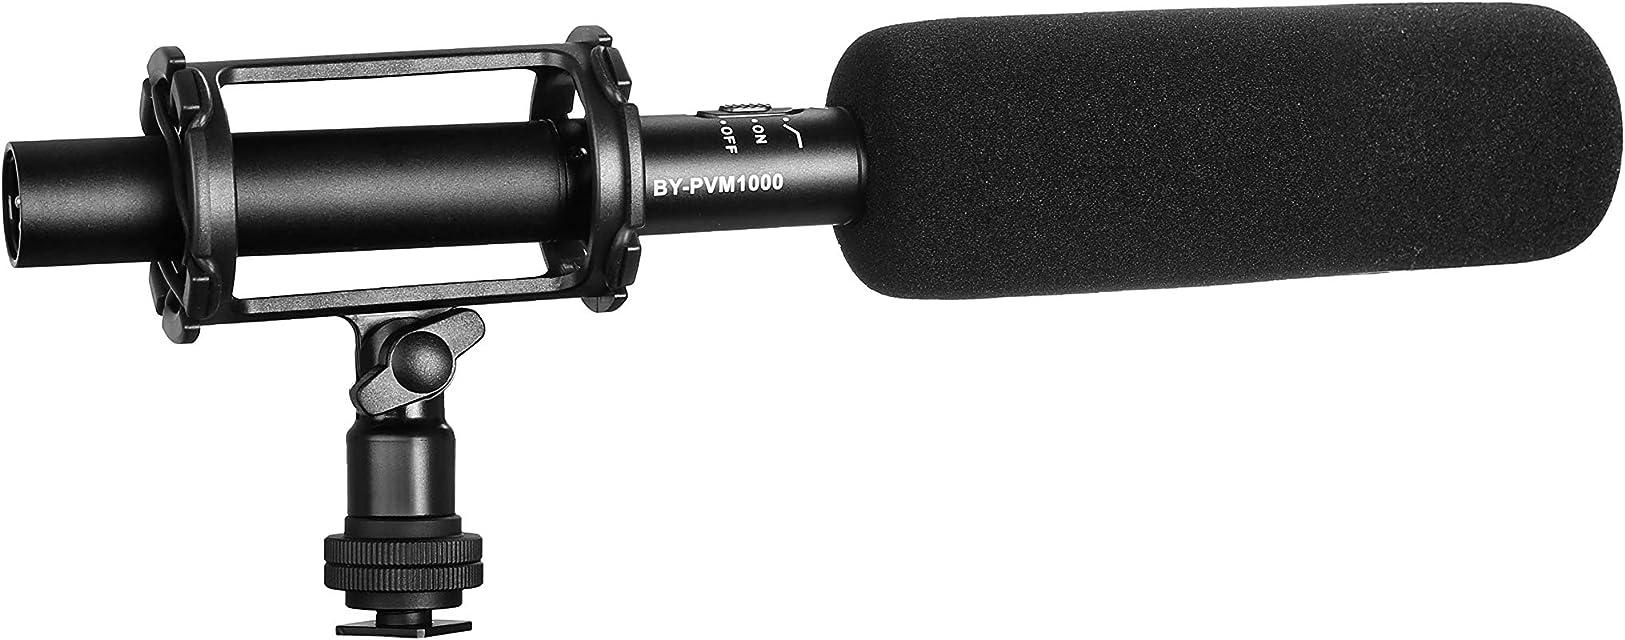 BOYA BY-PVM1000-Micrófono de condensador para entrevista (calidad de emisióncon protector de espuma y soporte de choque3 pinessalida XLR para cámaras Canon 6D5D3Nikon D800DSLR Sony A9Panasonic